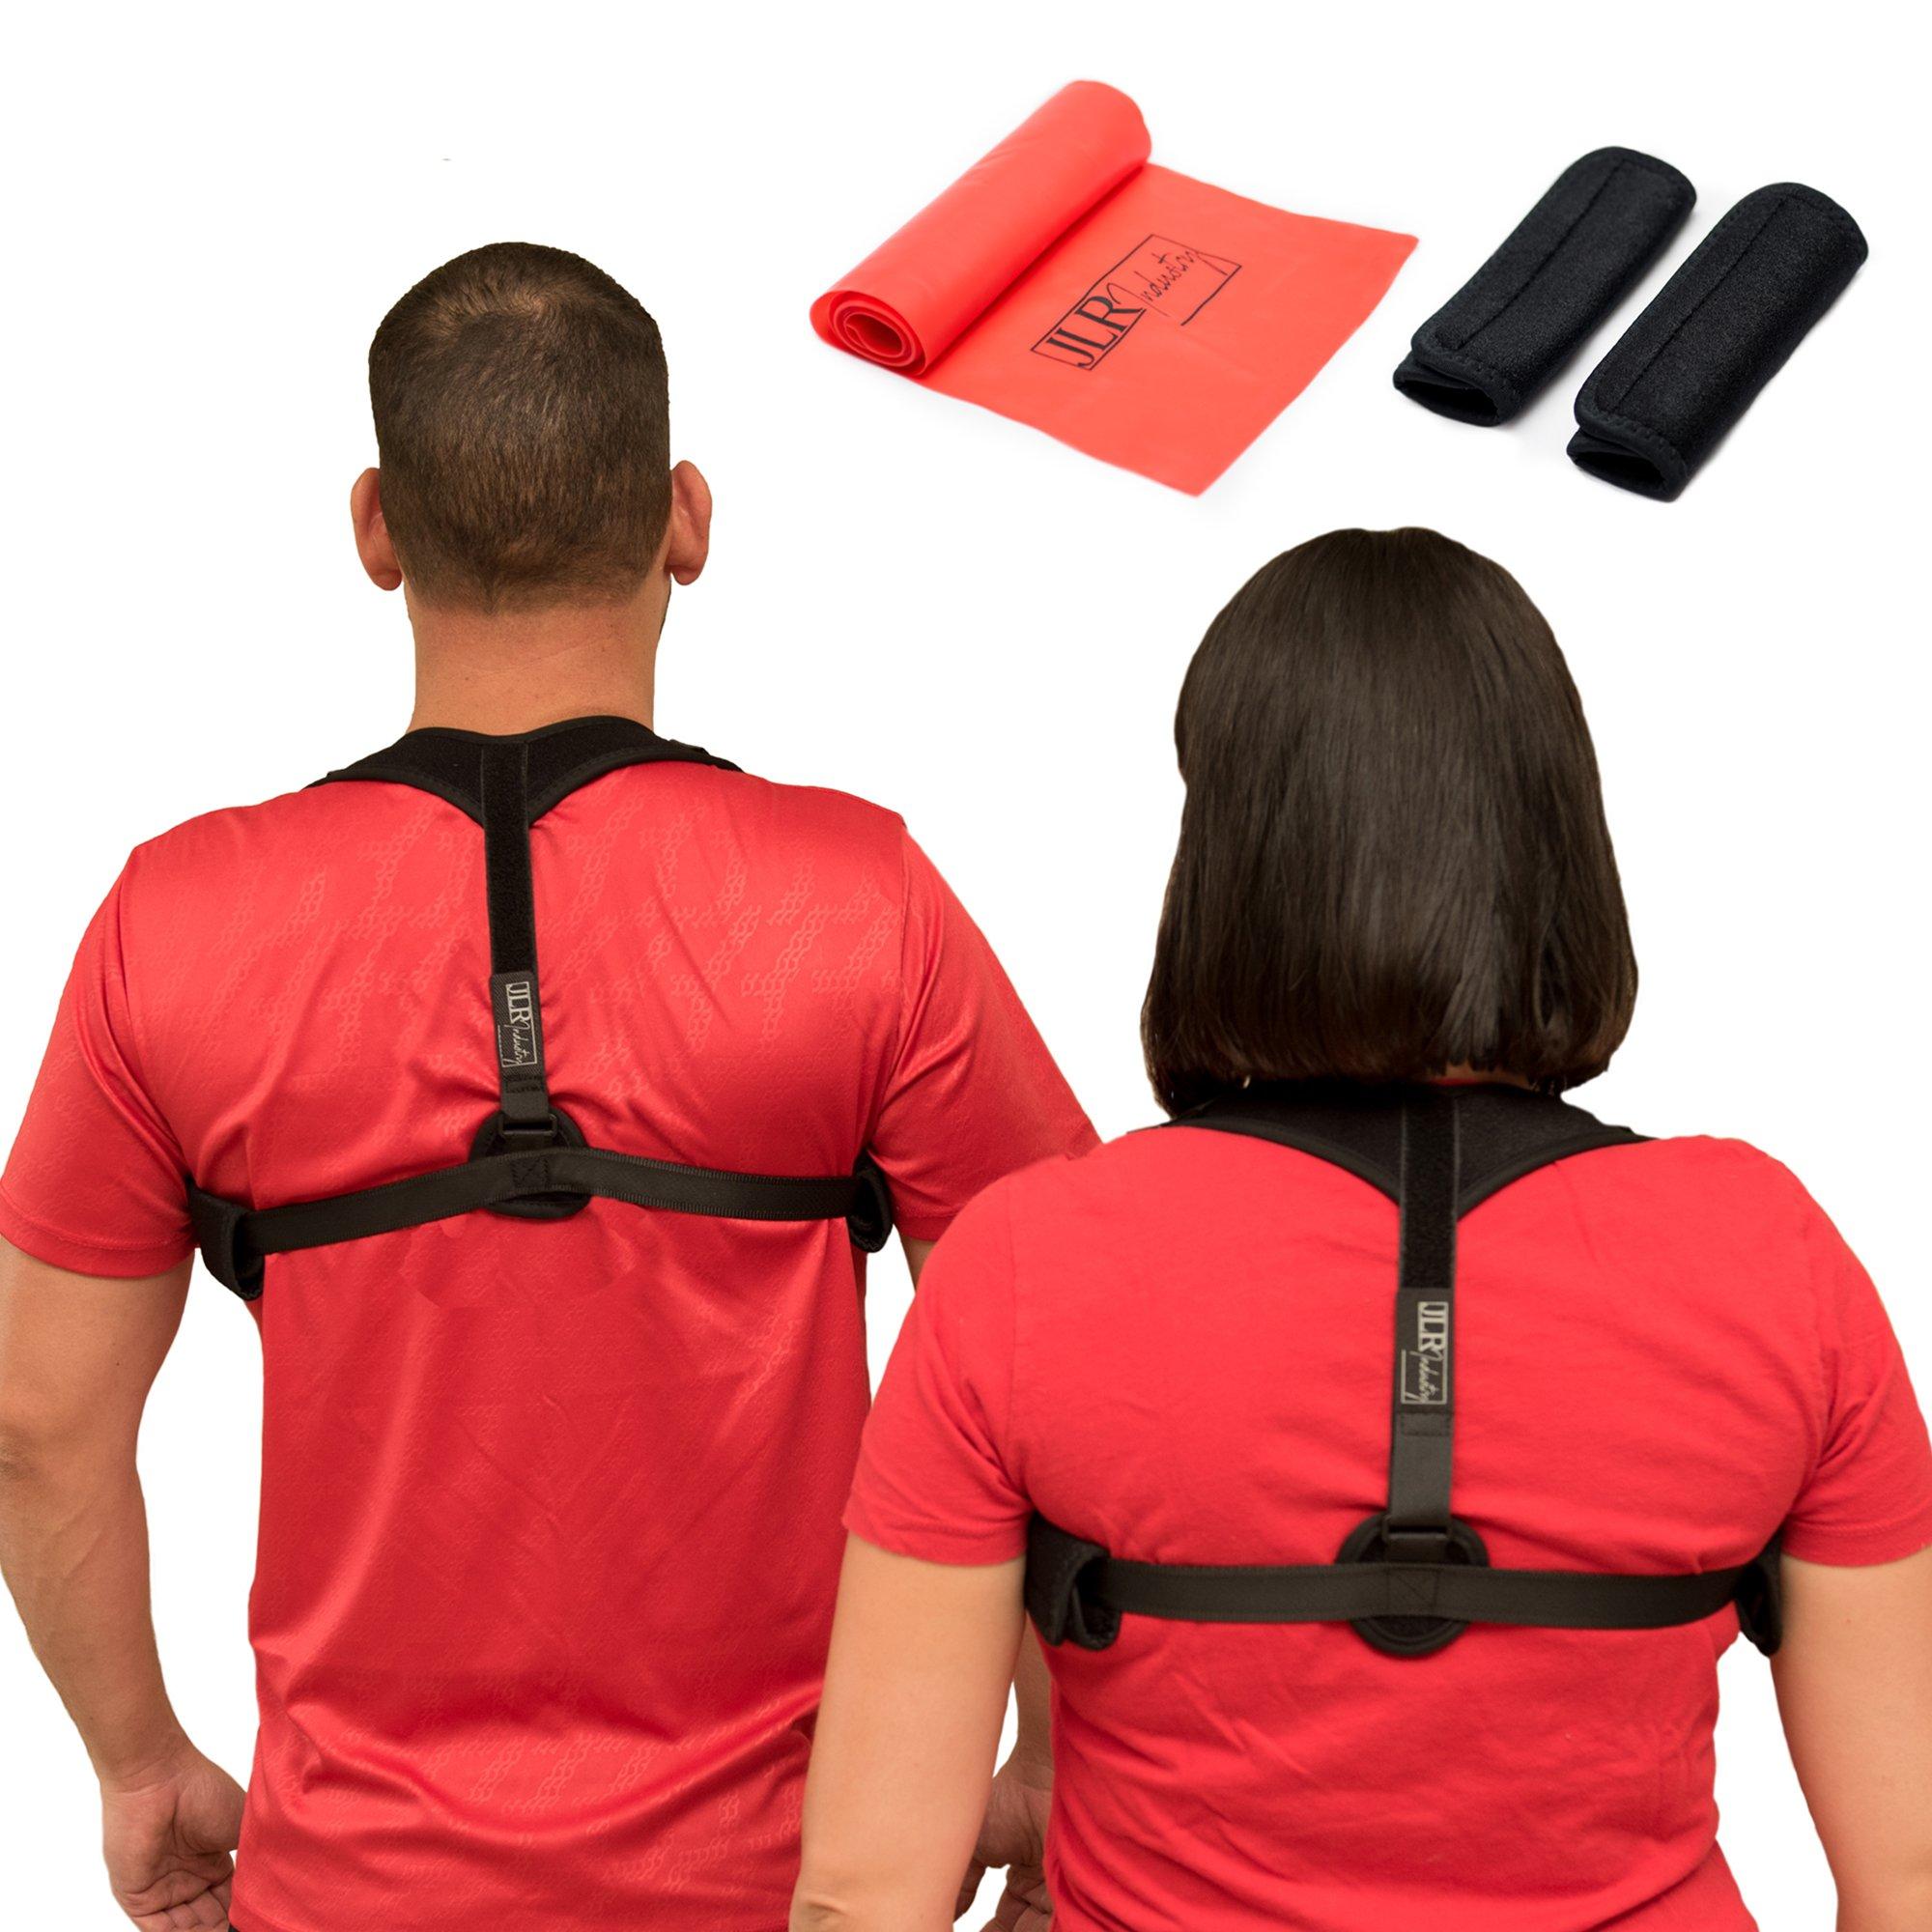 JLR Industry Posture Corrector For Women, Men & Kids – Back Pain Posture Support - Easy Adjustable, Breathable & Comfortable Back Brace Supporter & Underarm Pads & Resistance Band – Improve Back Pain